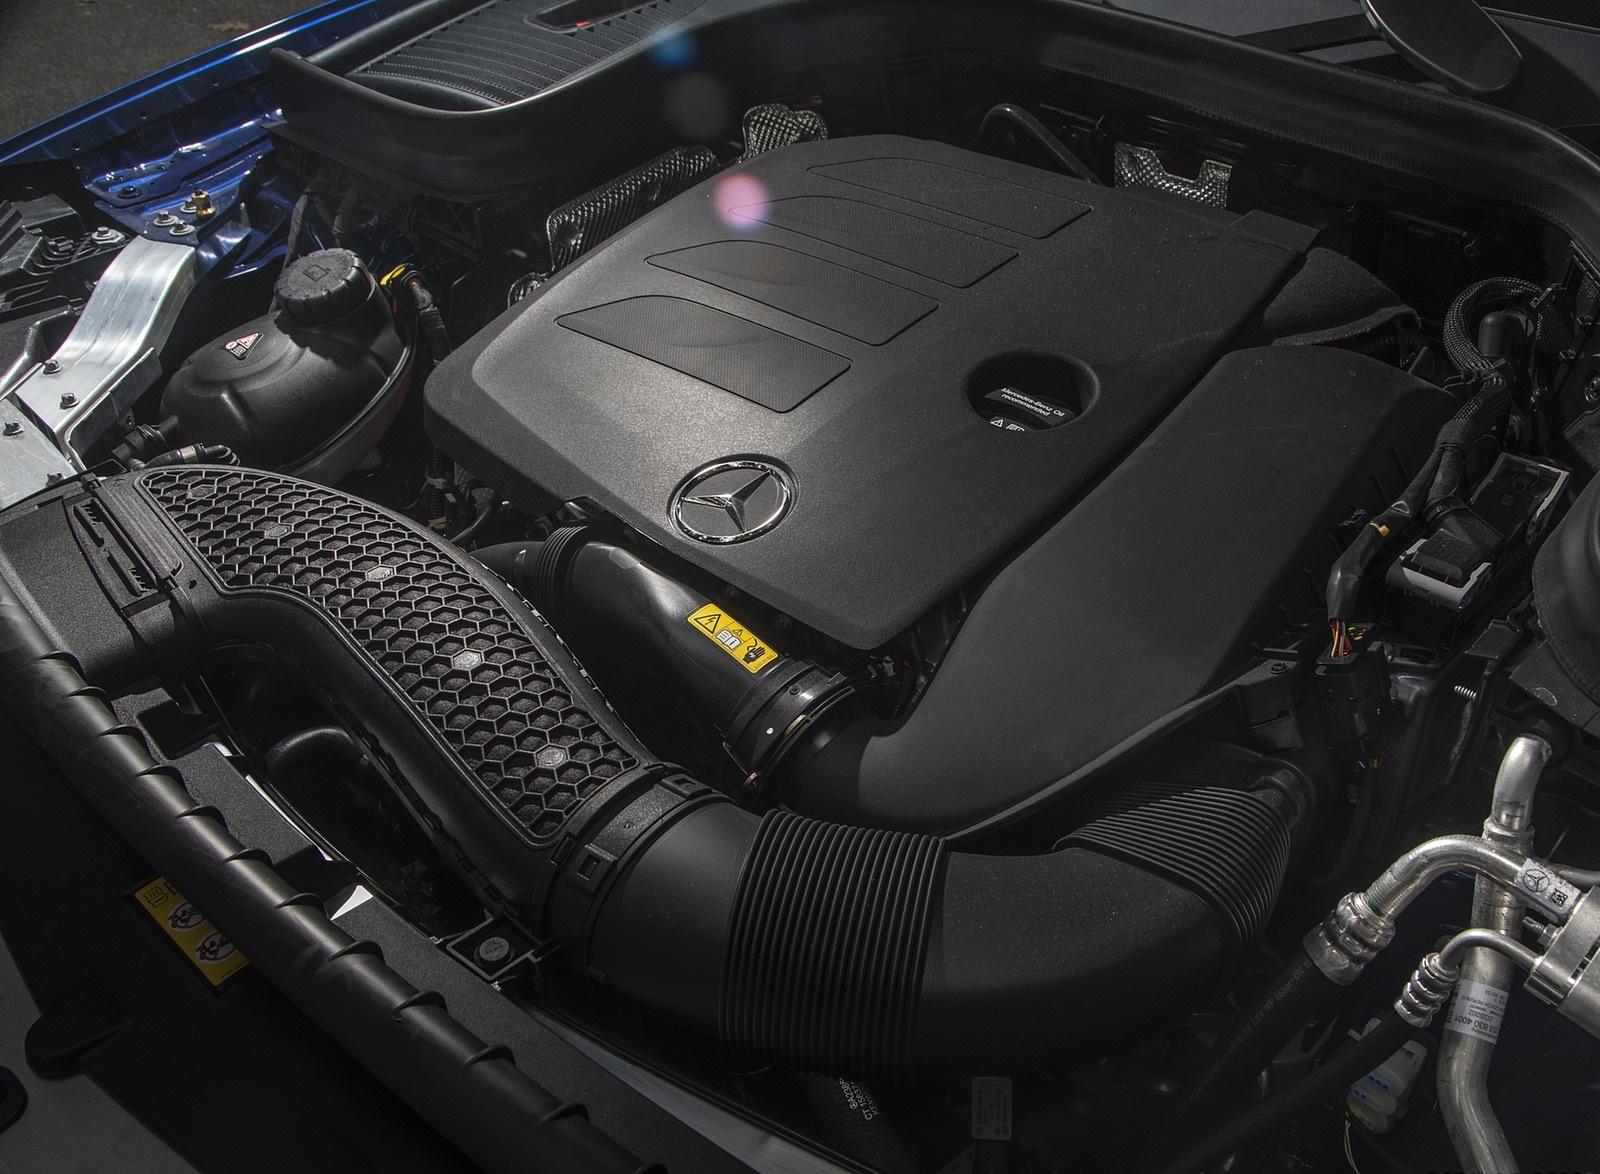 2020 Mercedes-Benz GLC 300 (US-Spec) Engine Wallpapers #16 of 62